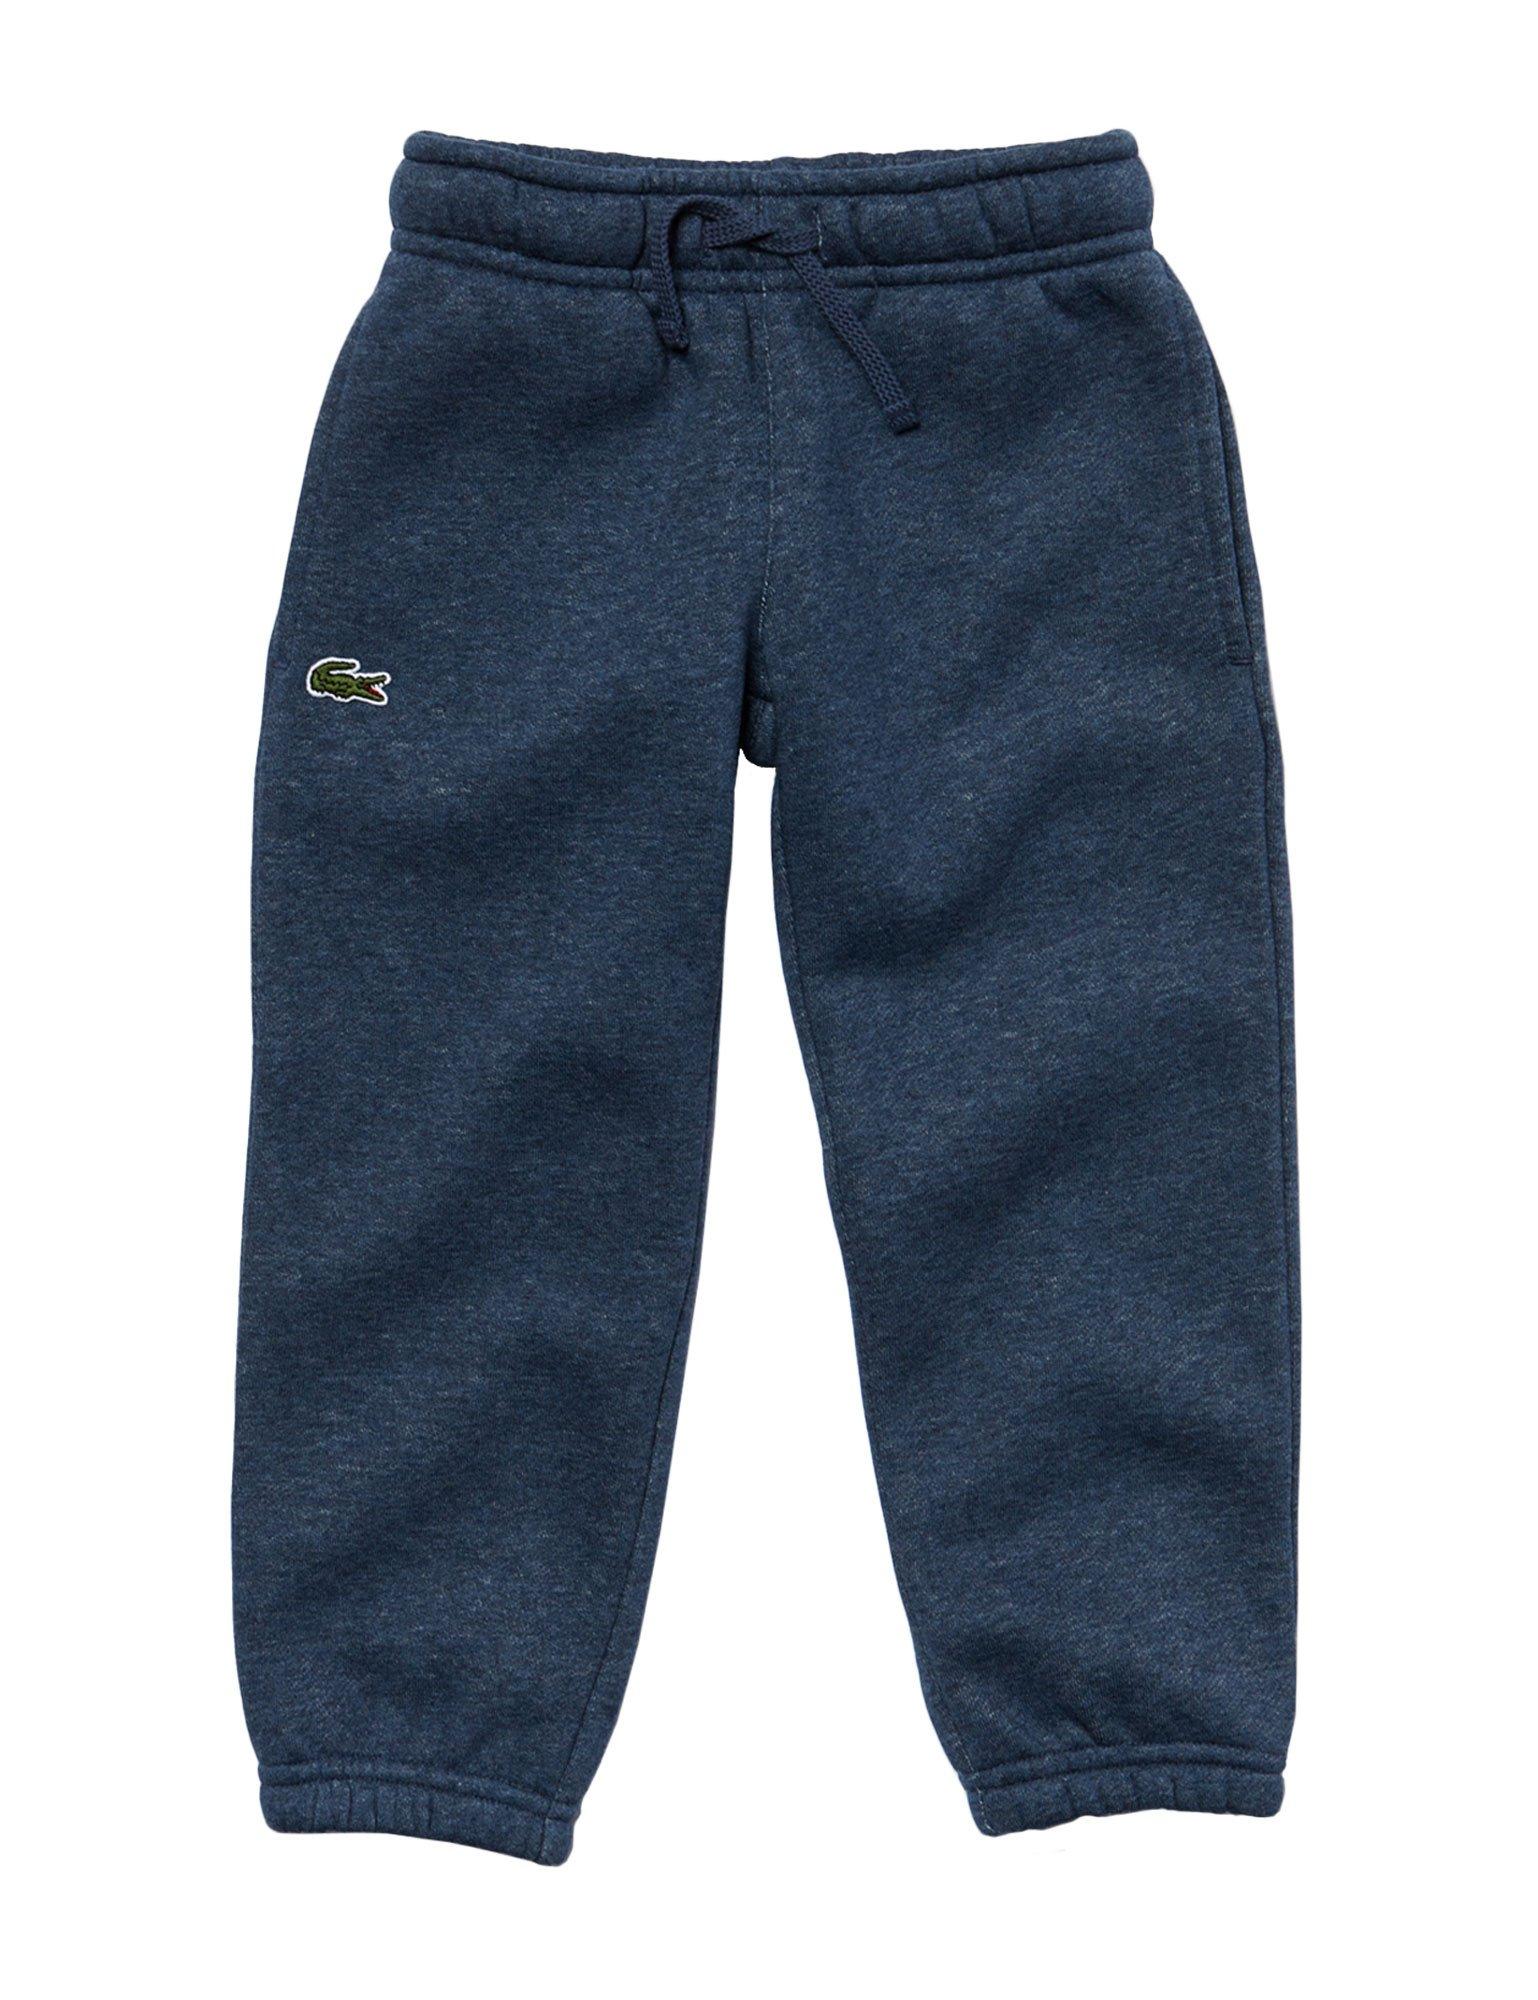 Lacoste Kids Blue MARL Jogging Bottoms 2 Years/86CM